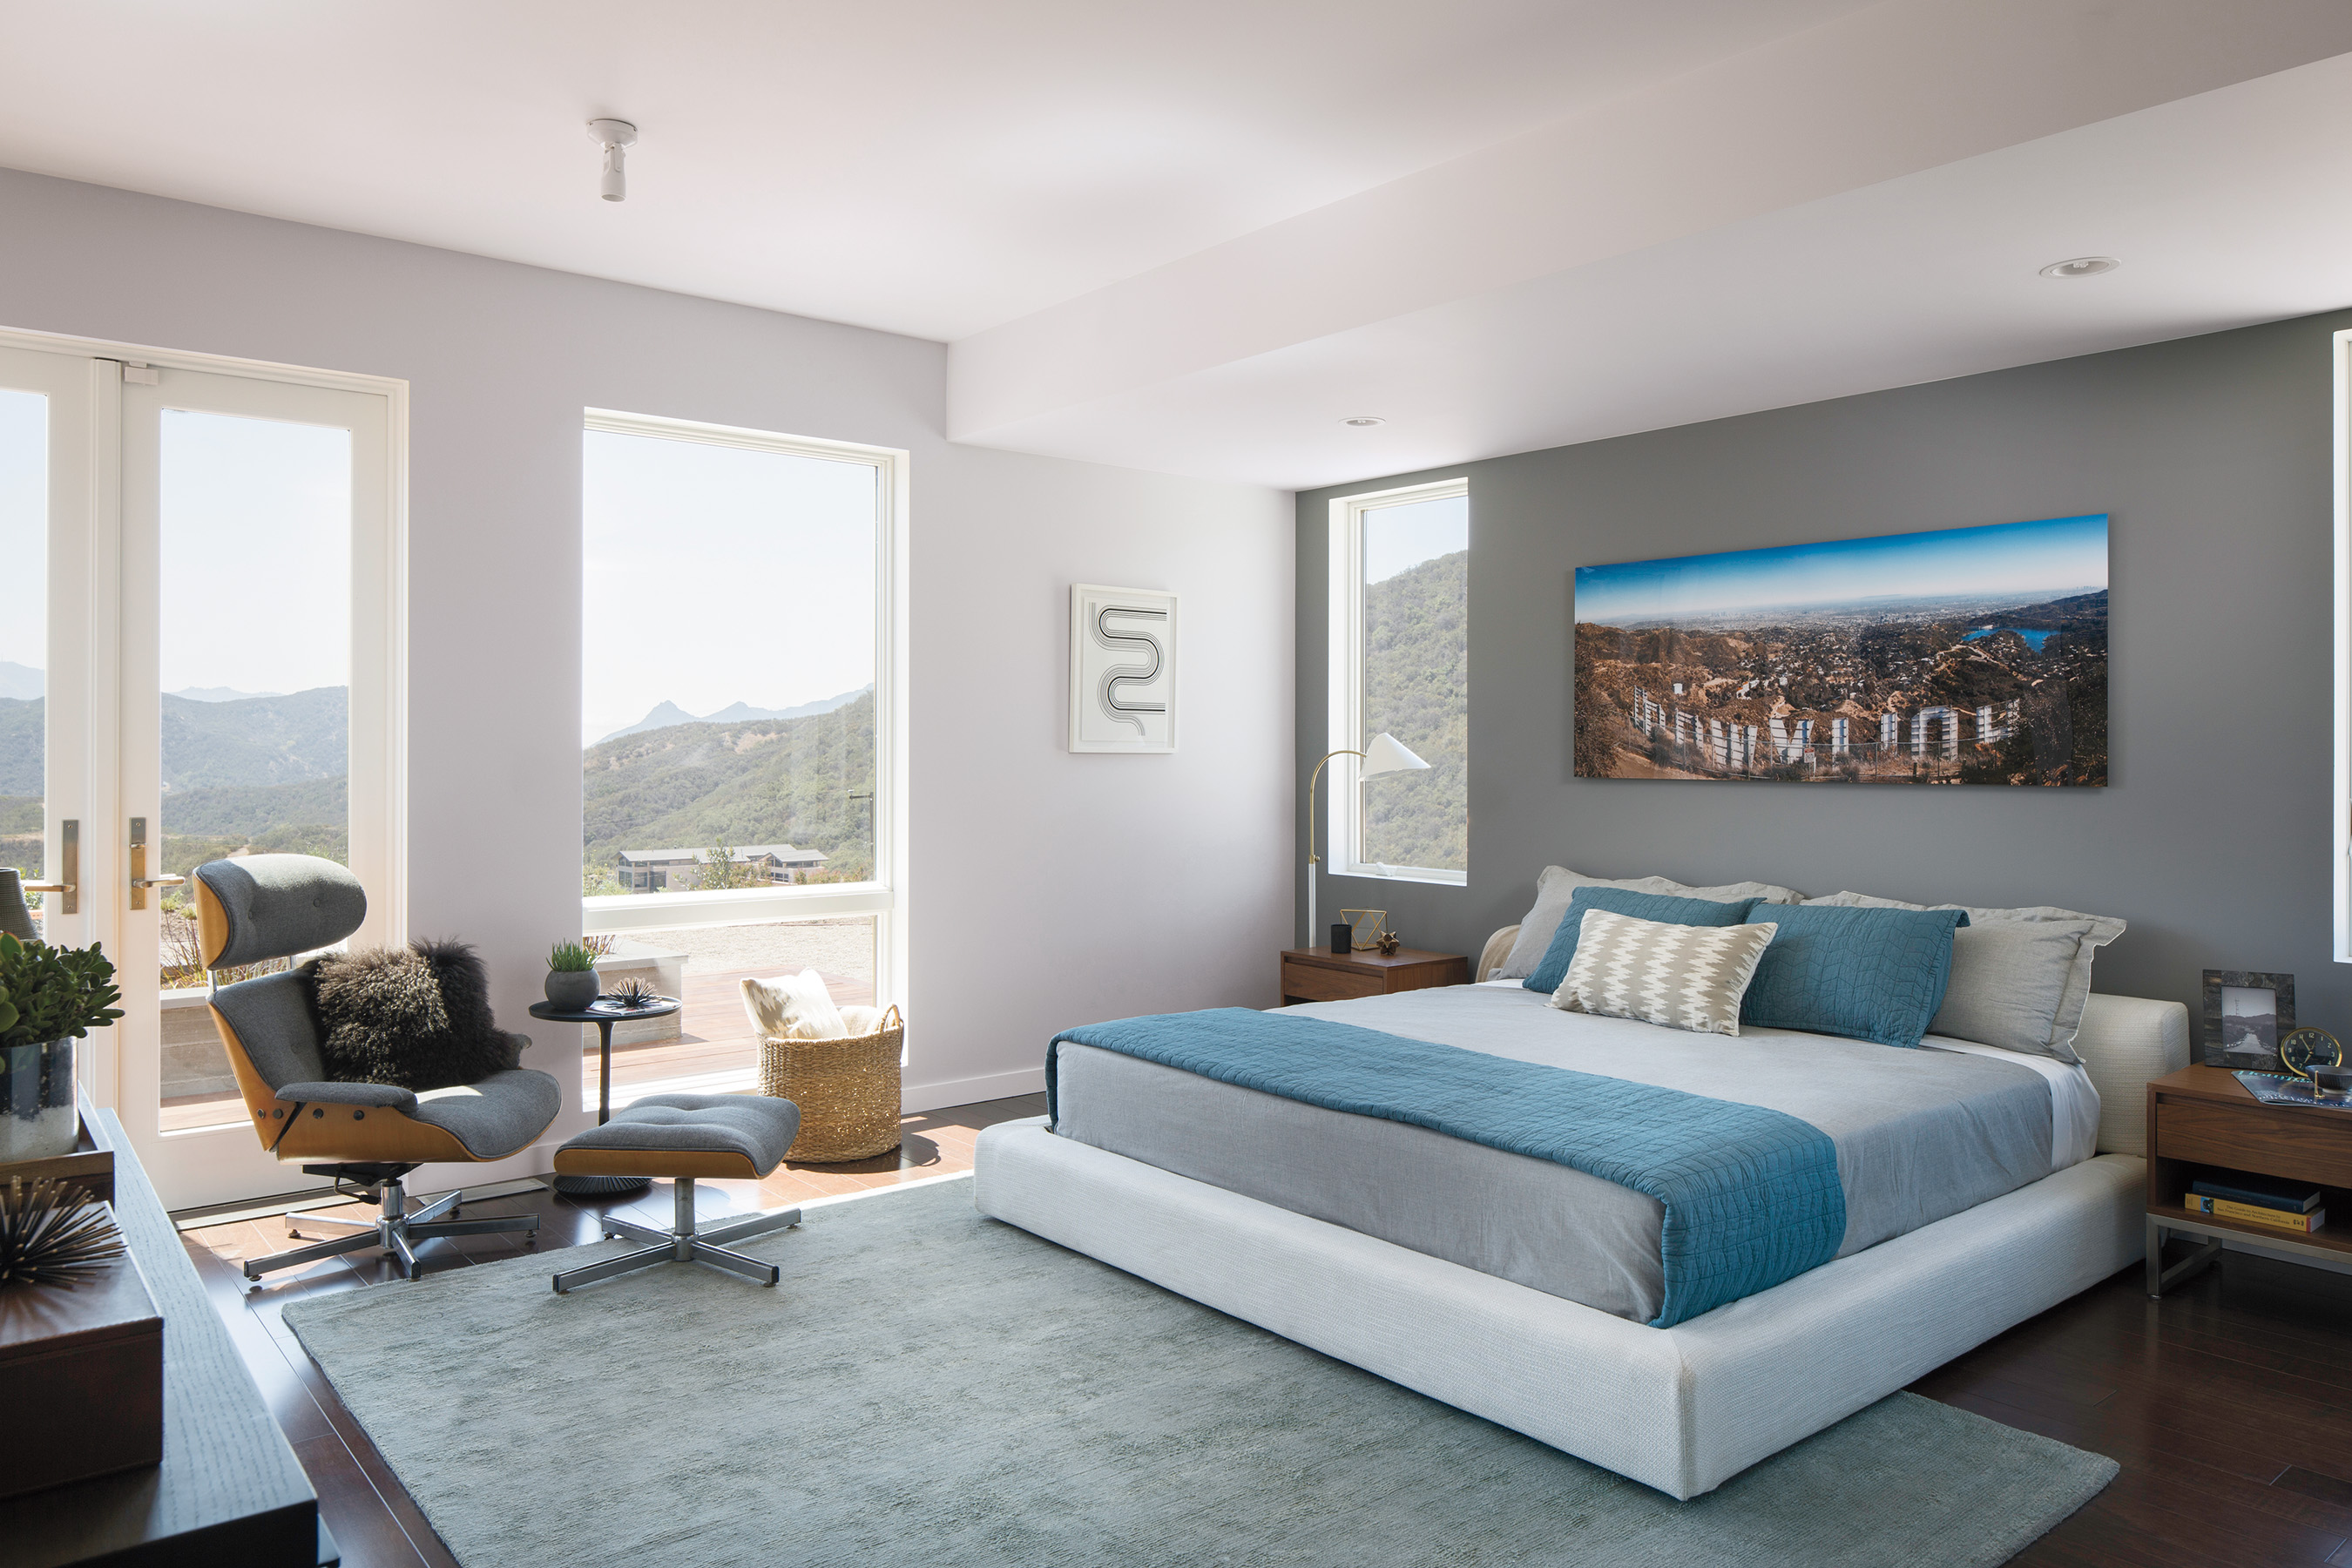 Blu Homes Breezehouse Awarded FirstEver 2014 Dream